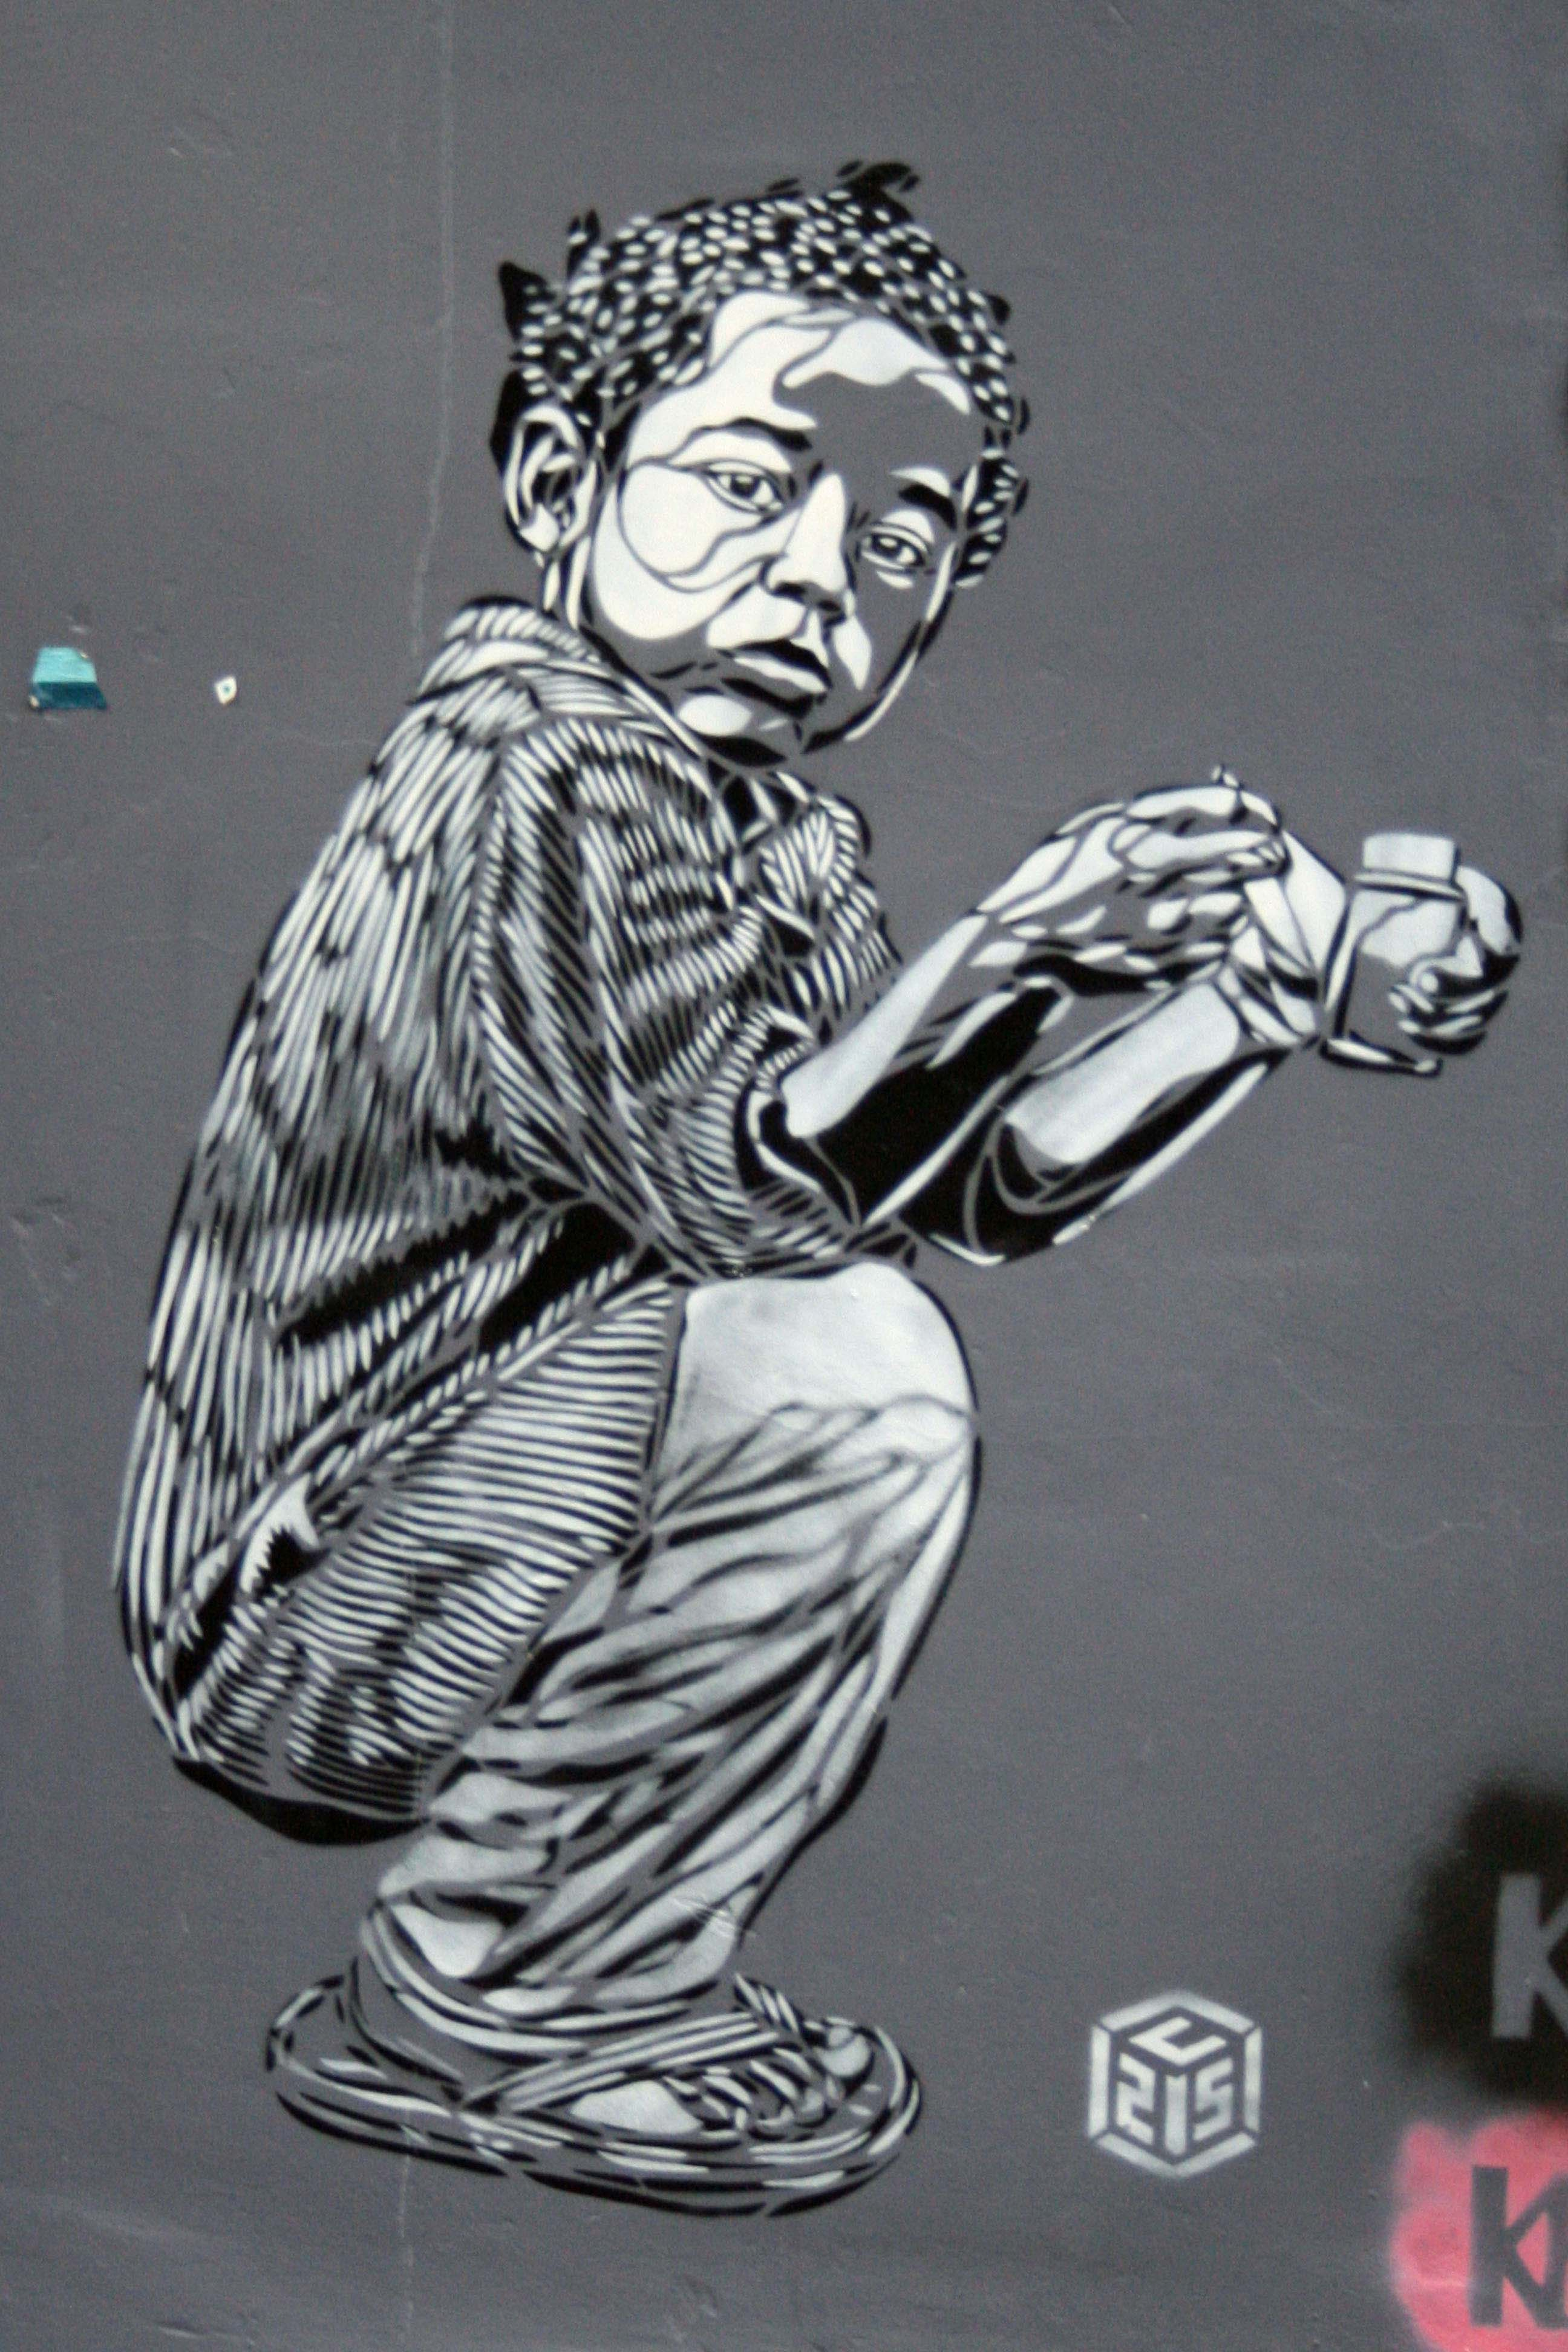 Crouching - Street Art by C215 in Brighton